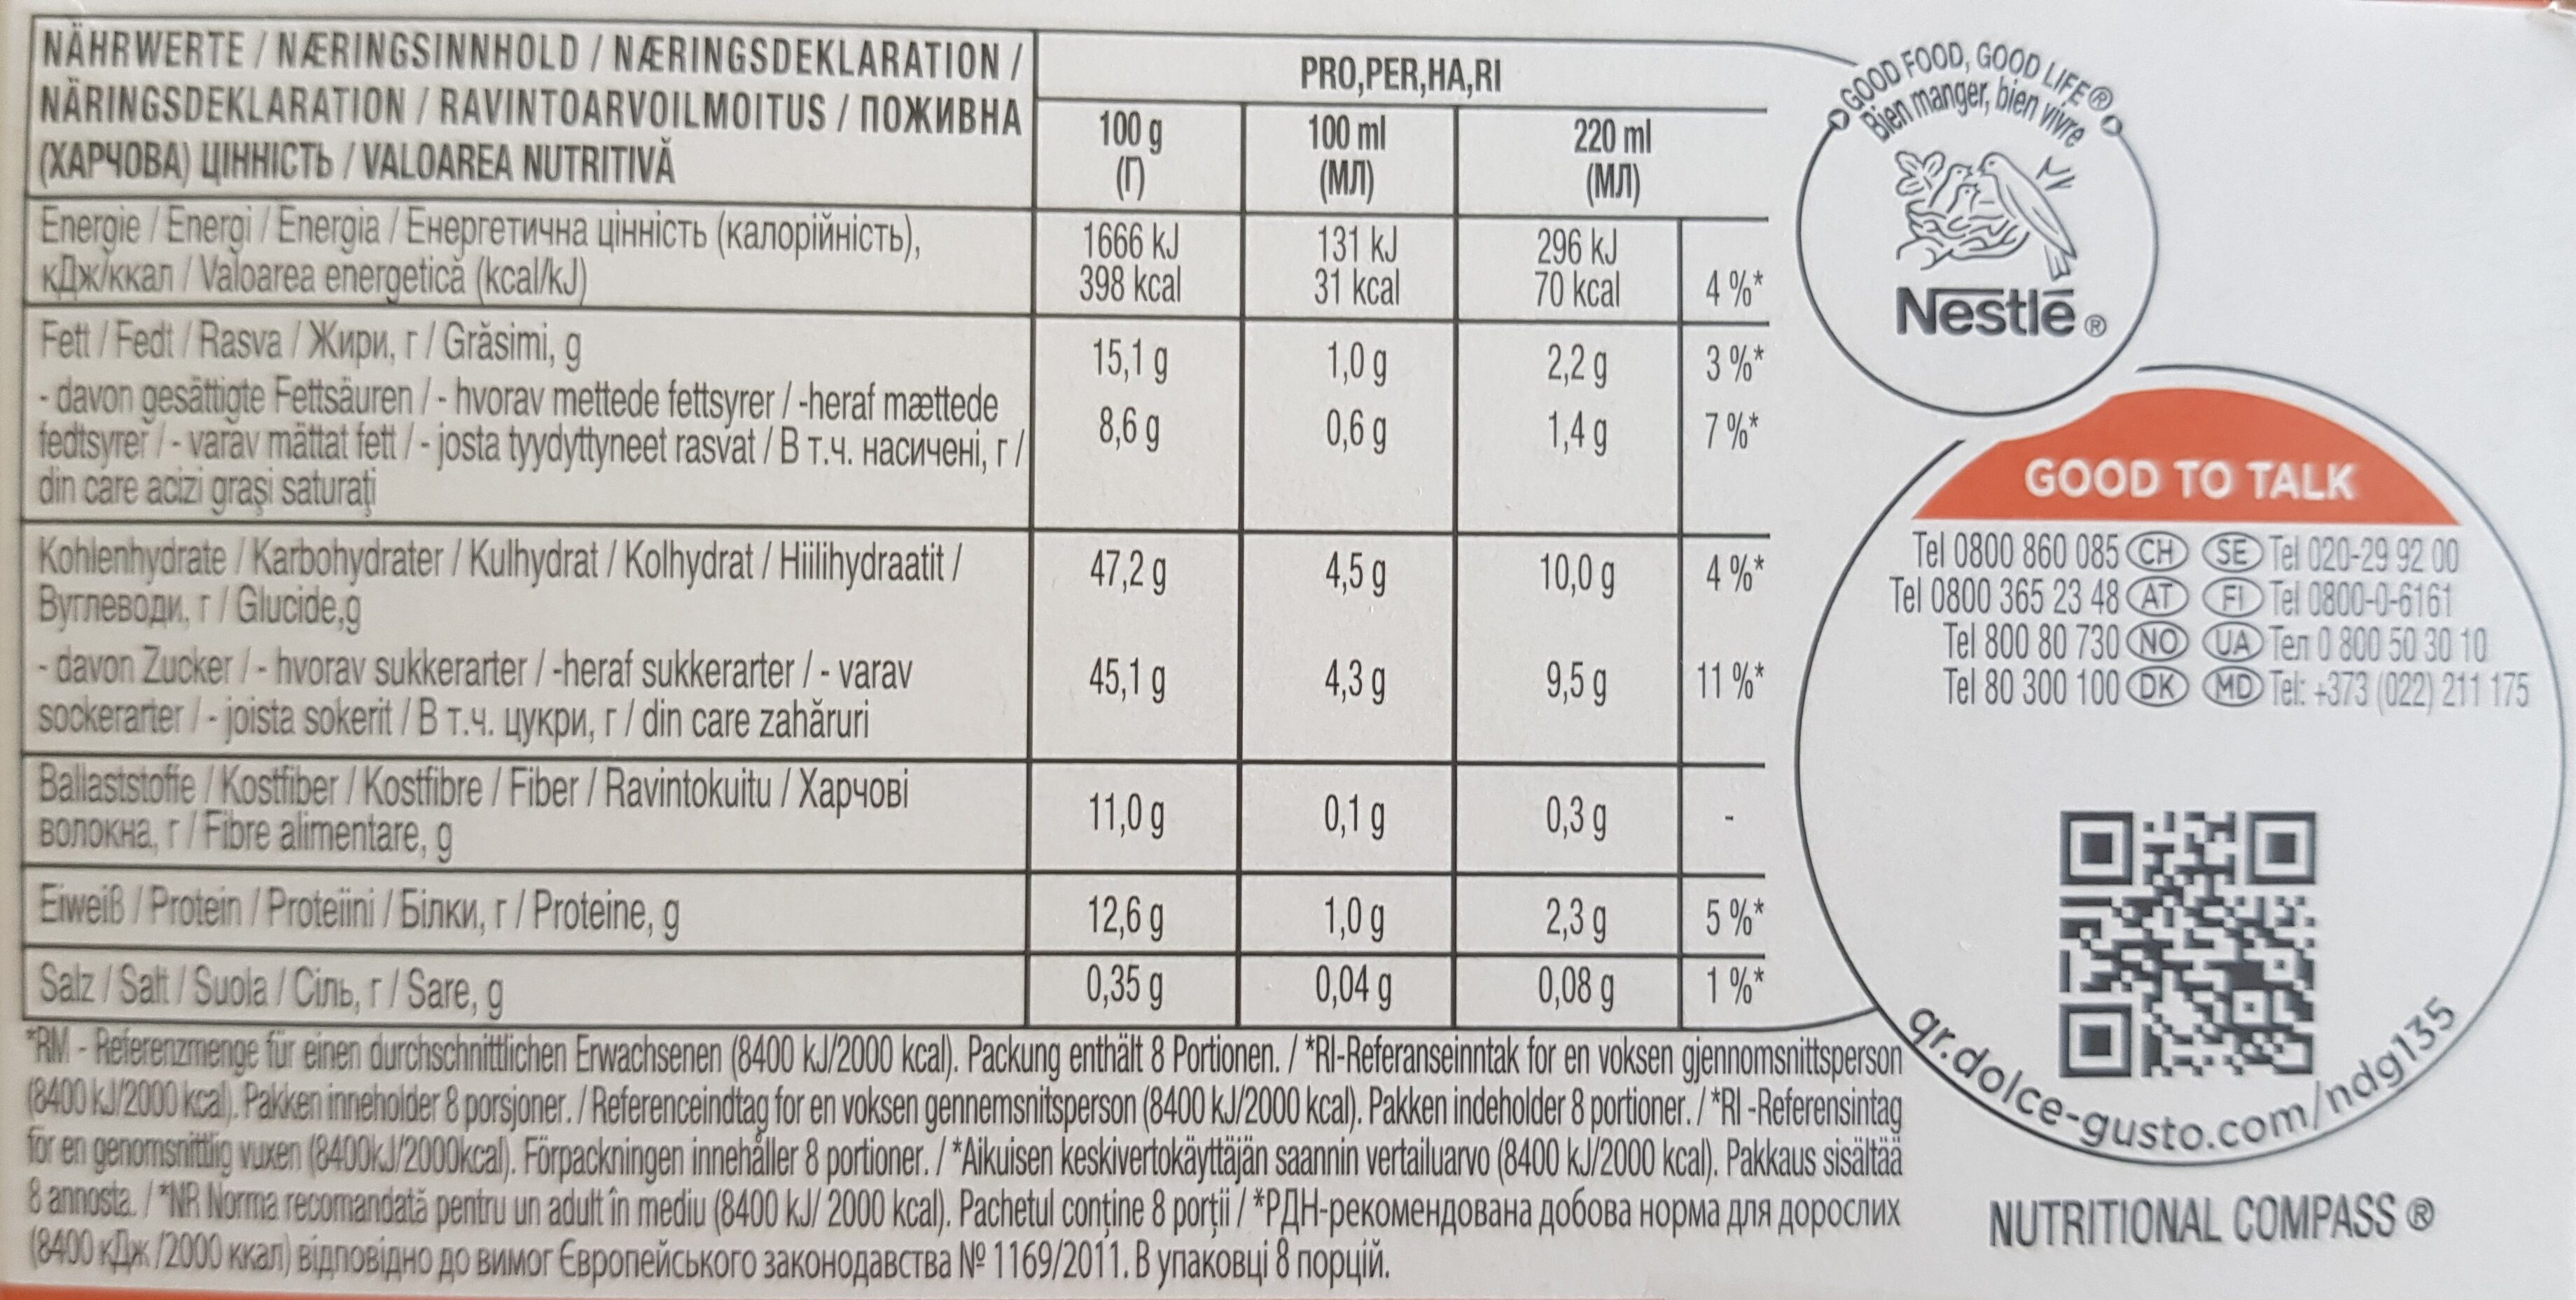 D.gus Latt Macc Caramel Nescafe - Nutrition facts - fr